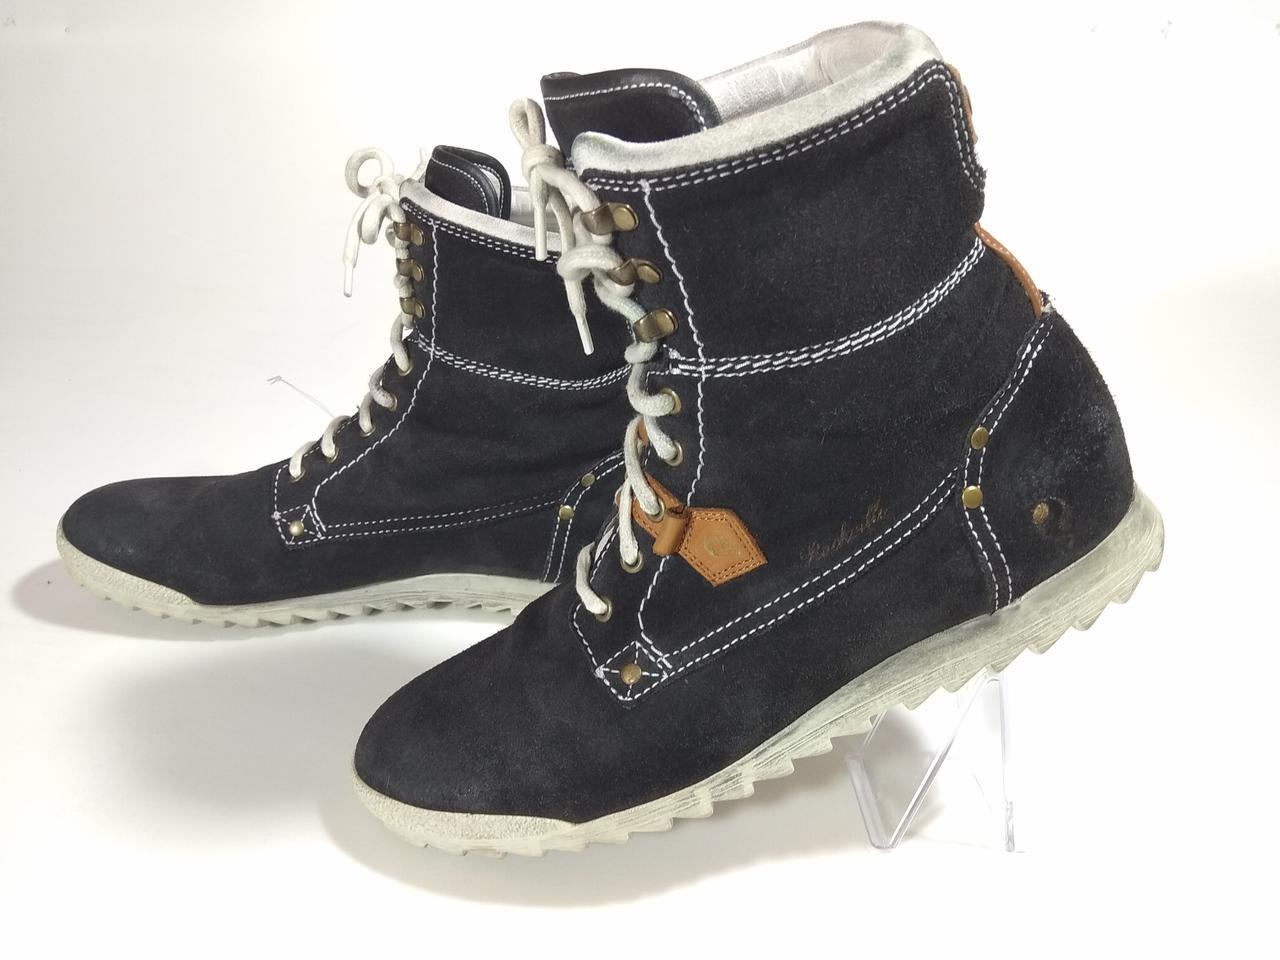 Ботинки .кеды   мужские 44 размер бренд (Sport)Rockville (Португалия)